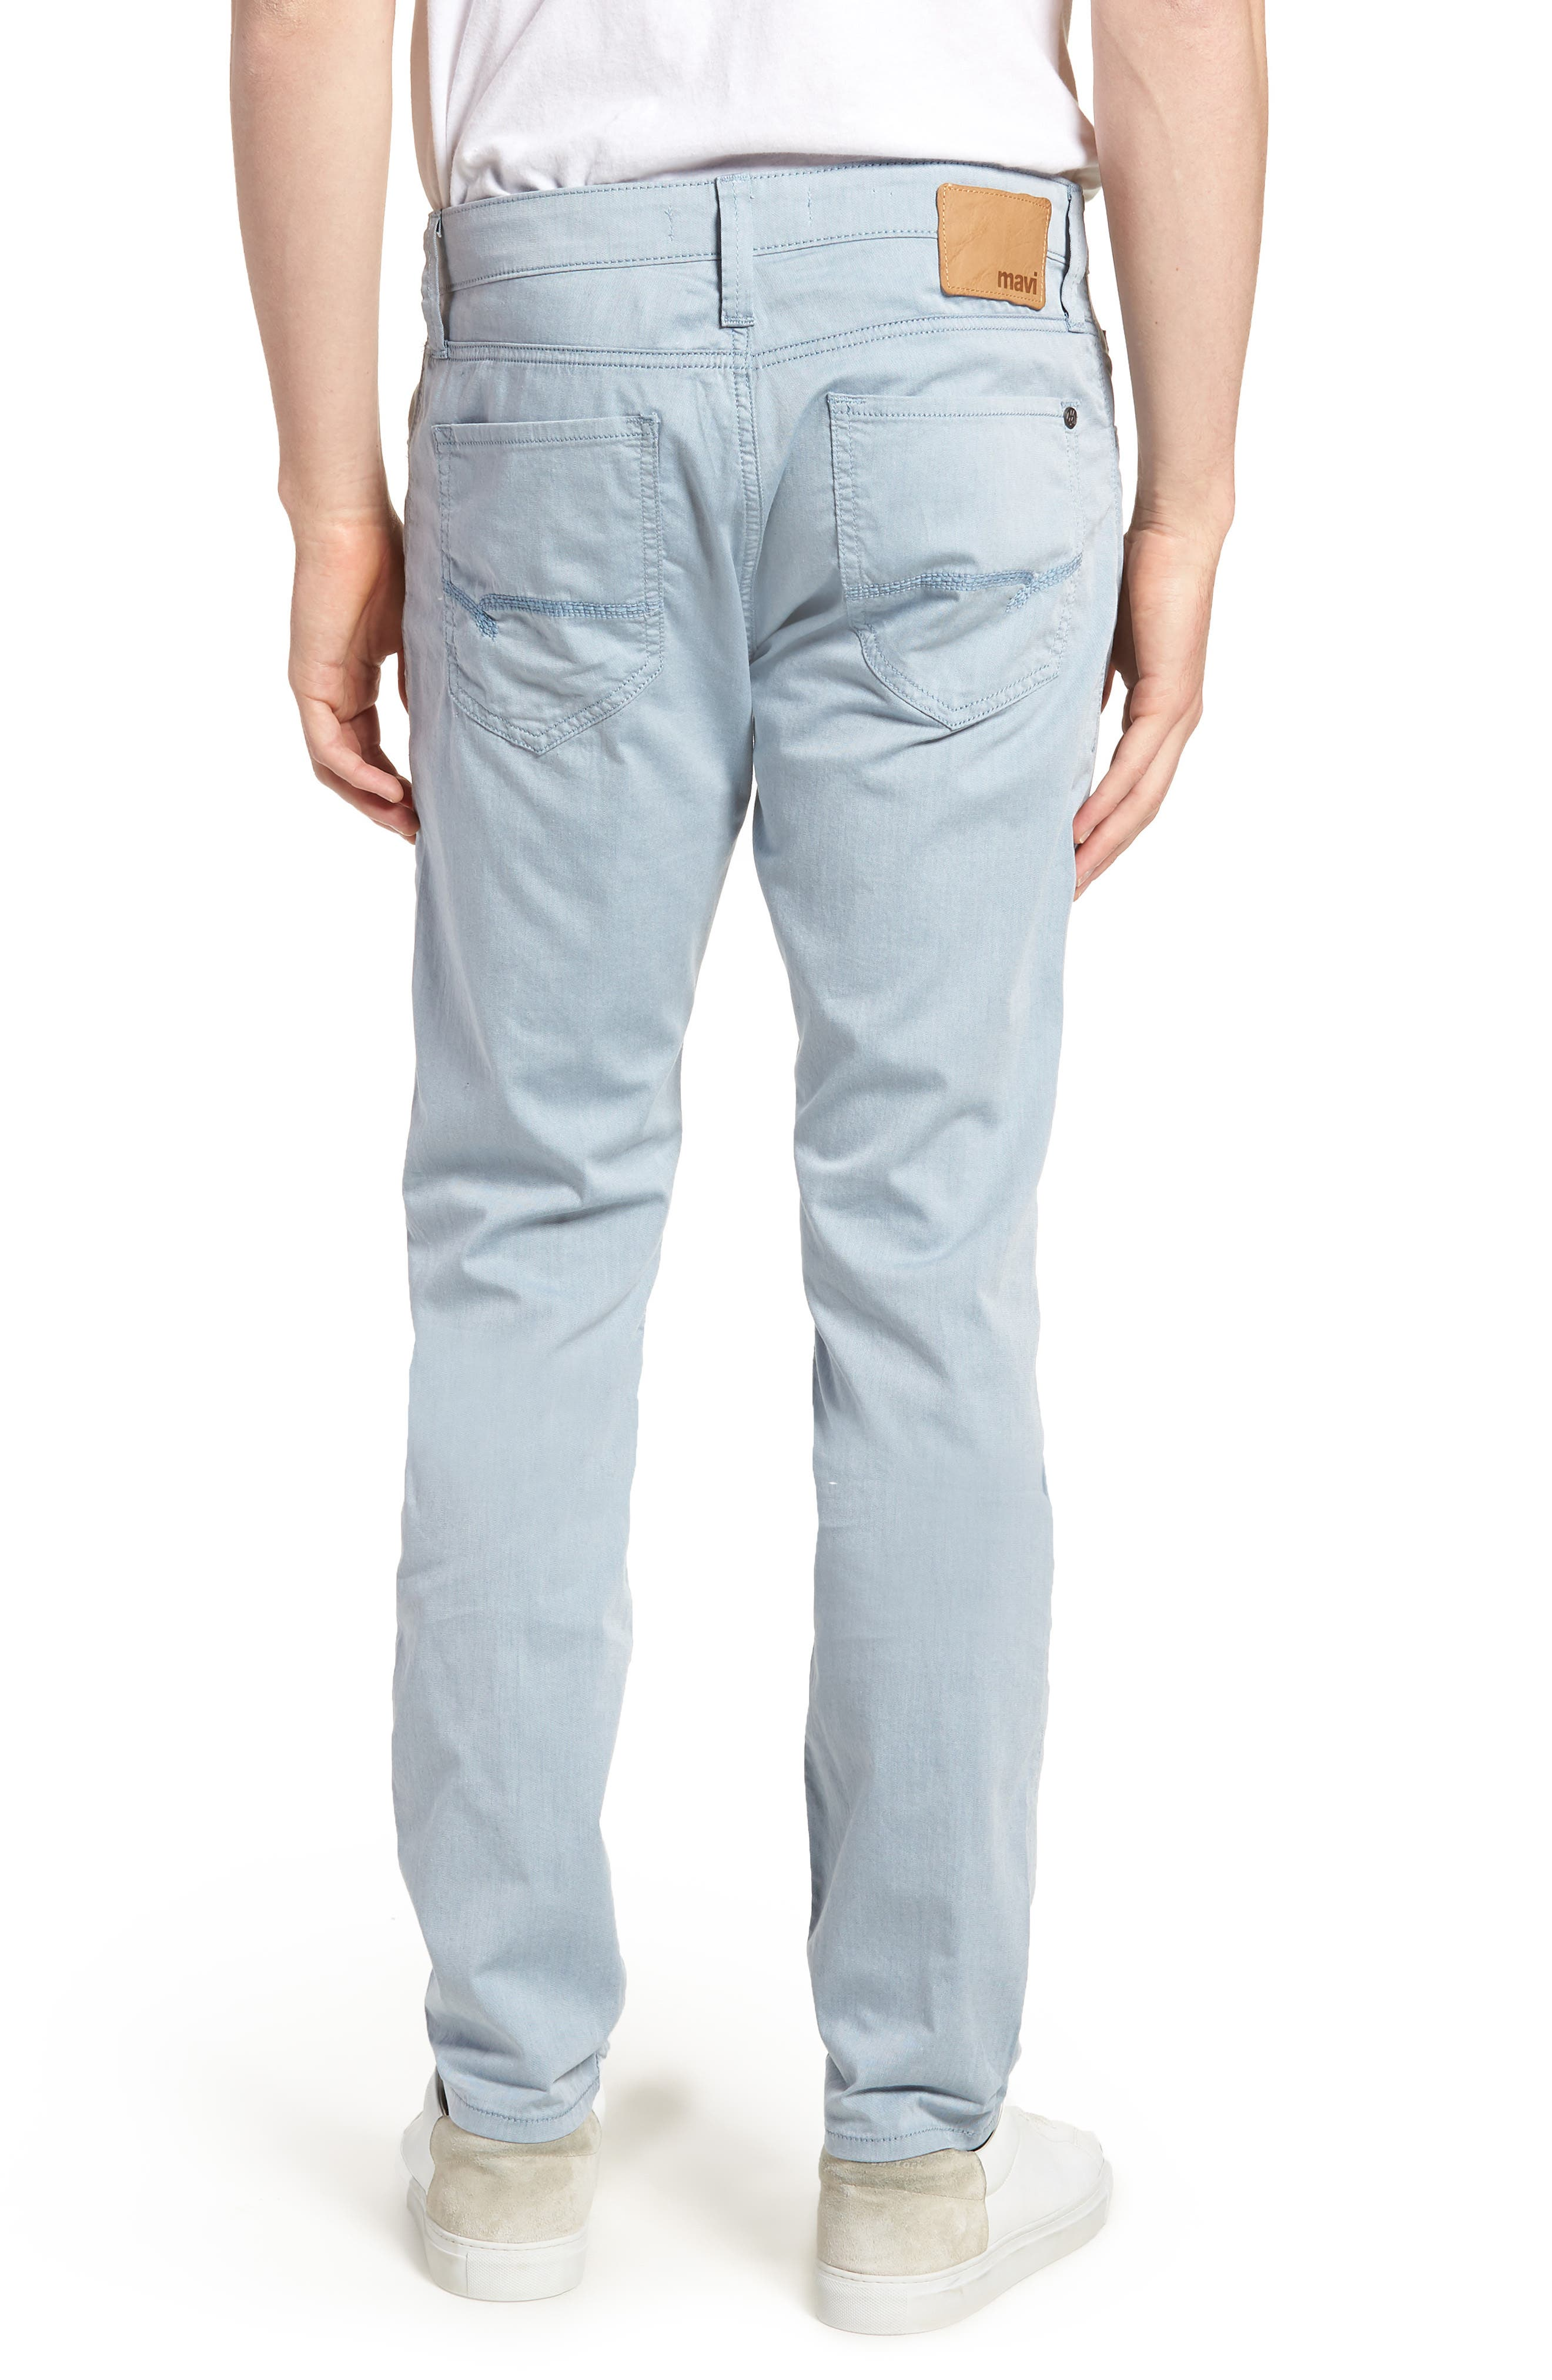 Jake Slim Fit Jeans,                             Alternate thumbnail 2, color,                             Blue Reversed